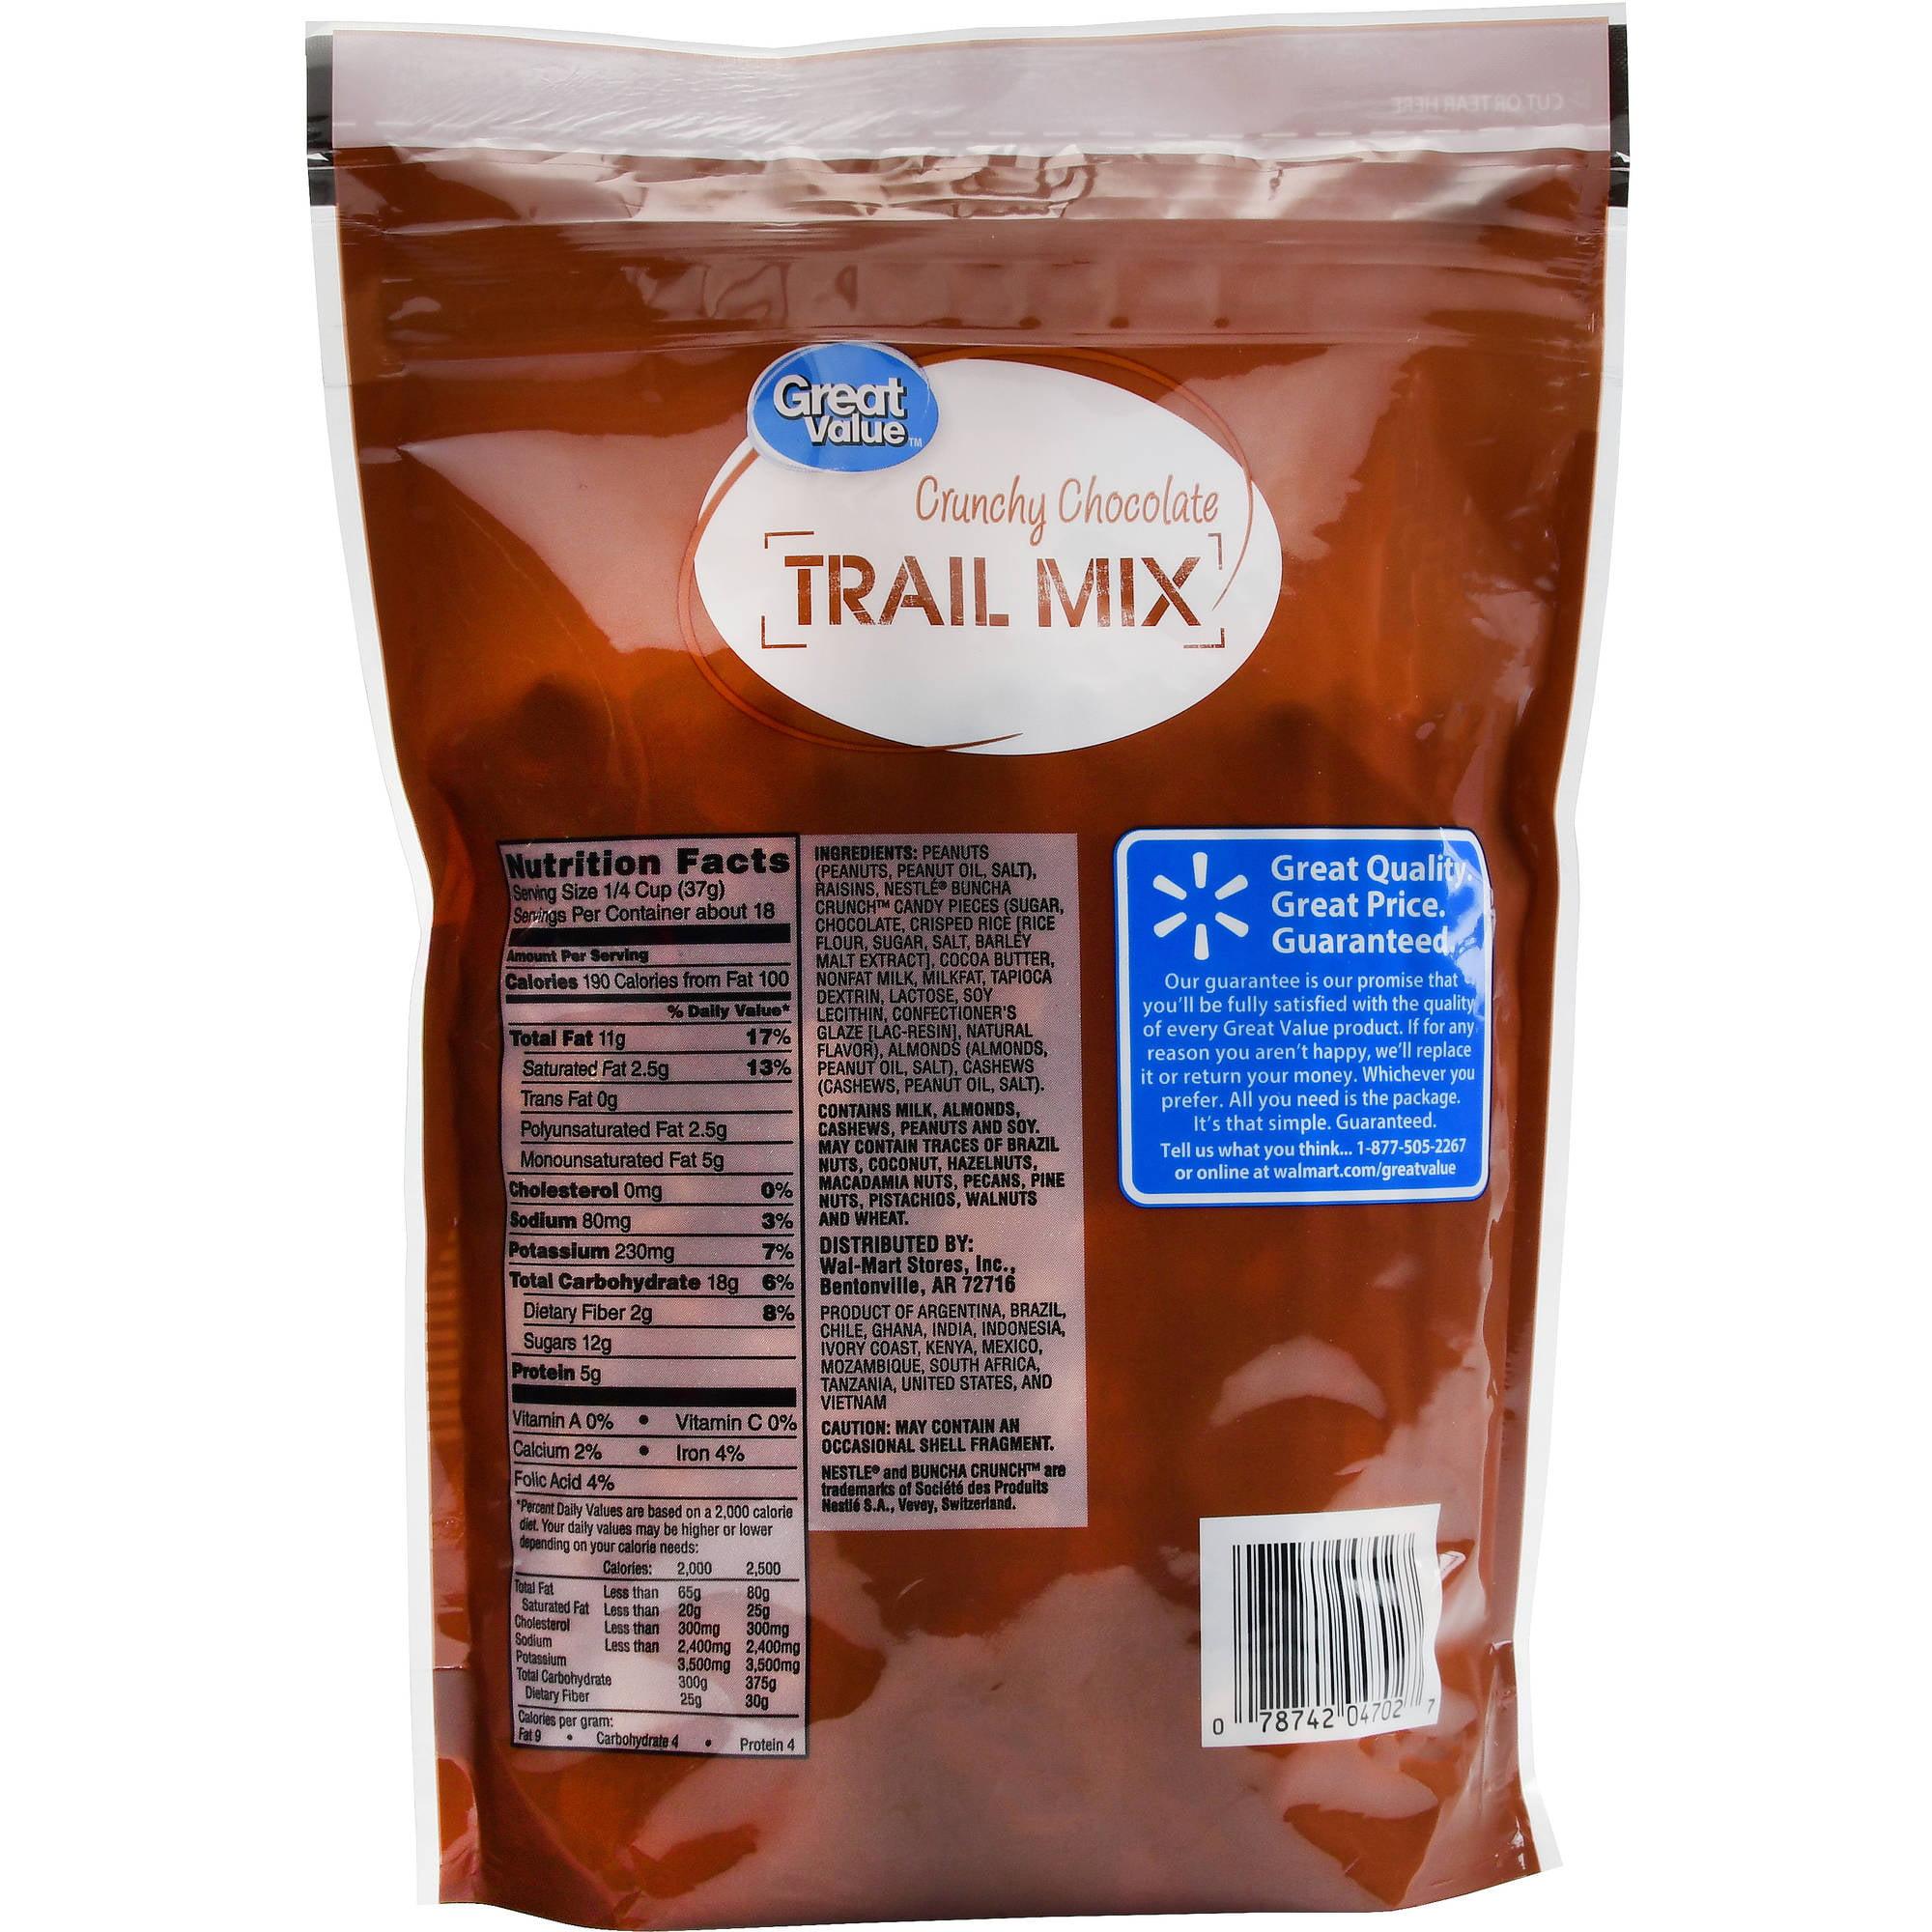 Great Value Trail Mix, Asian Nut Crunch, 20 oz - Walmart